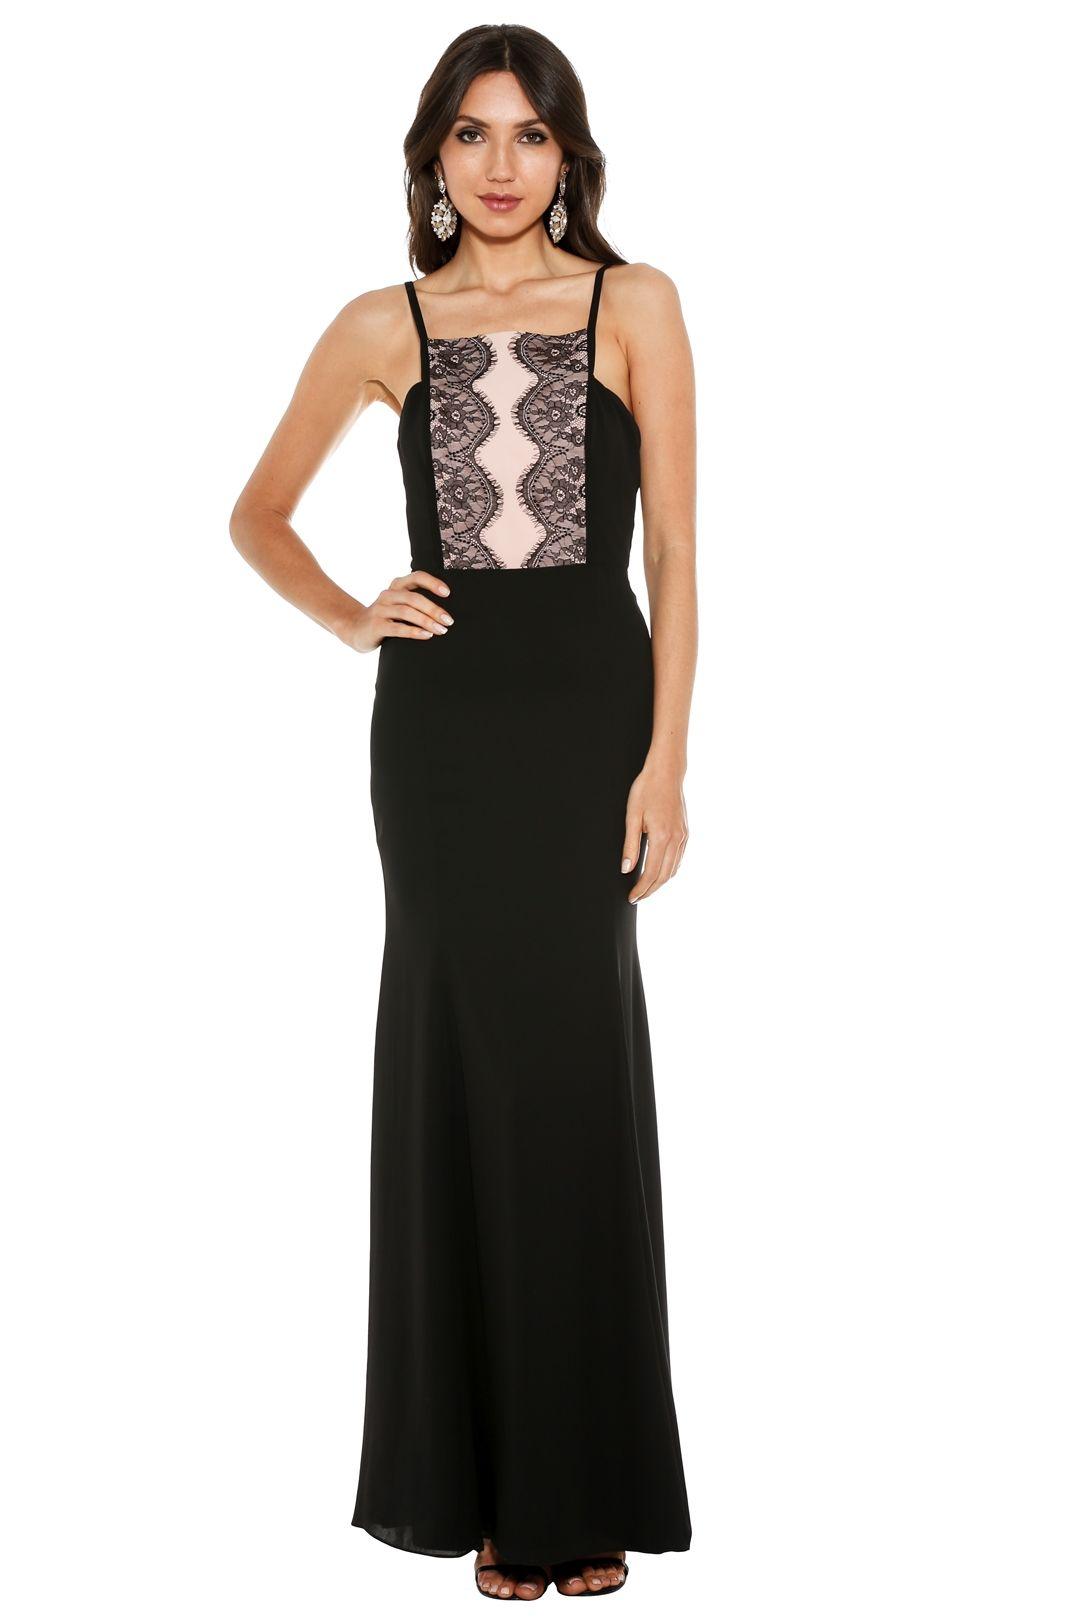 Fame & Partners - Megan Lace Dress - Black - Front